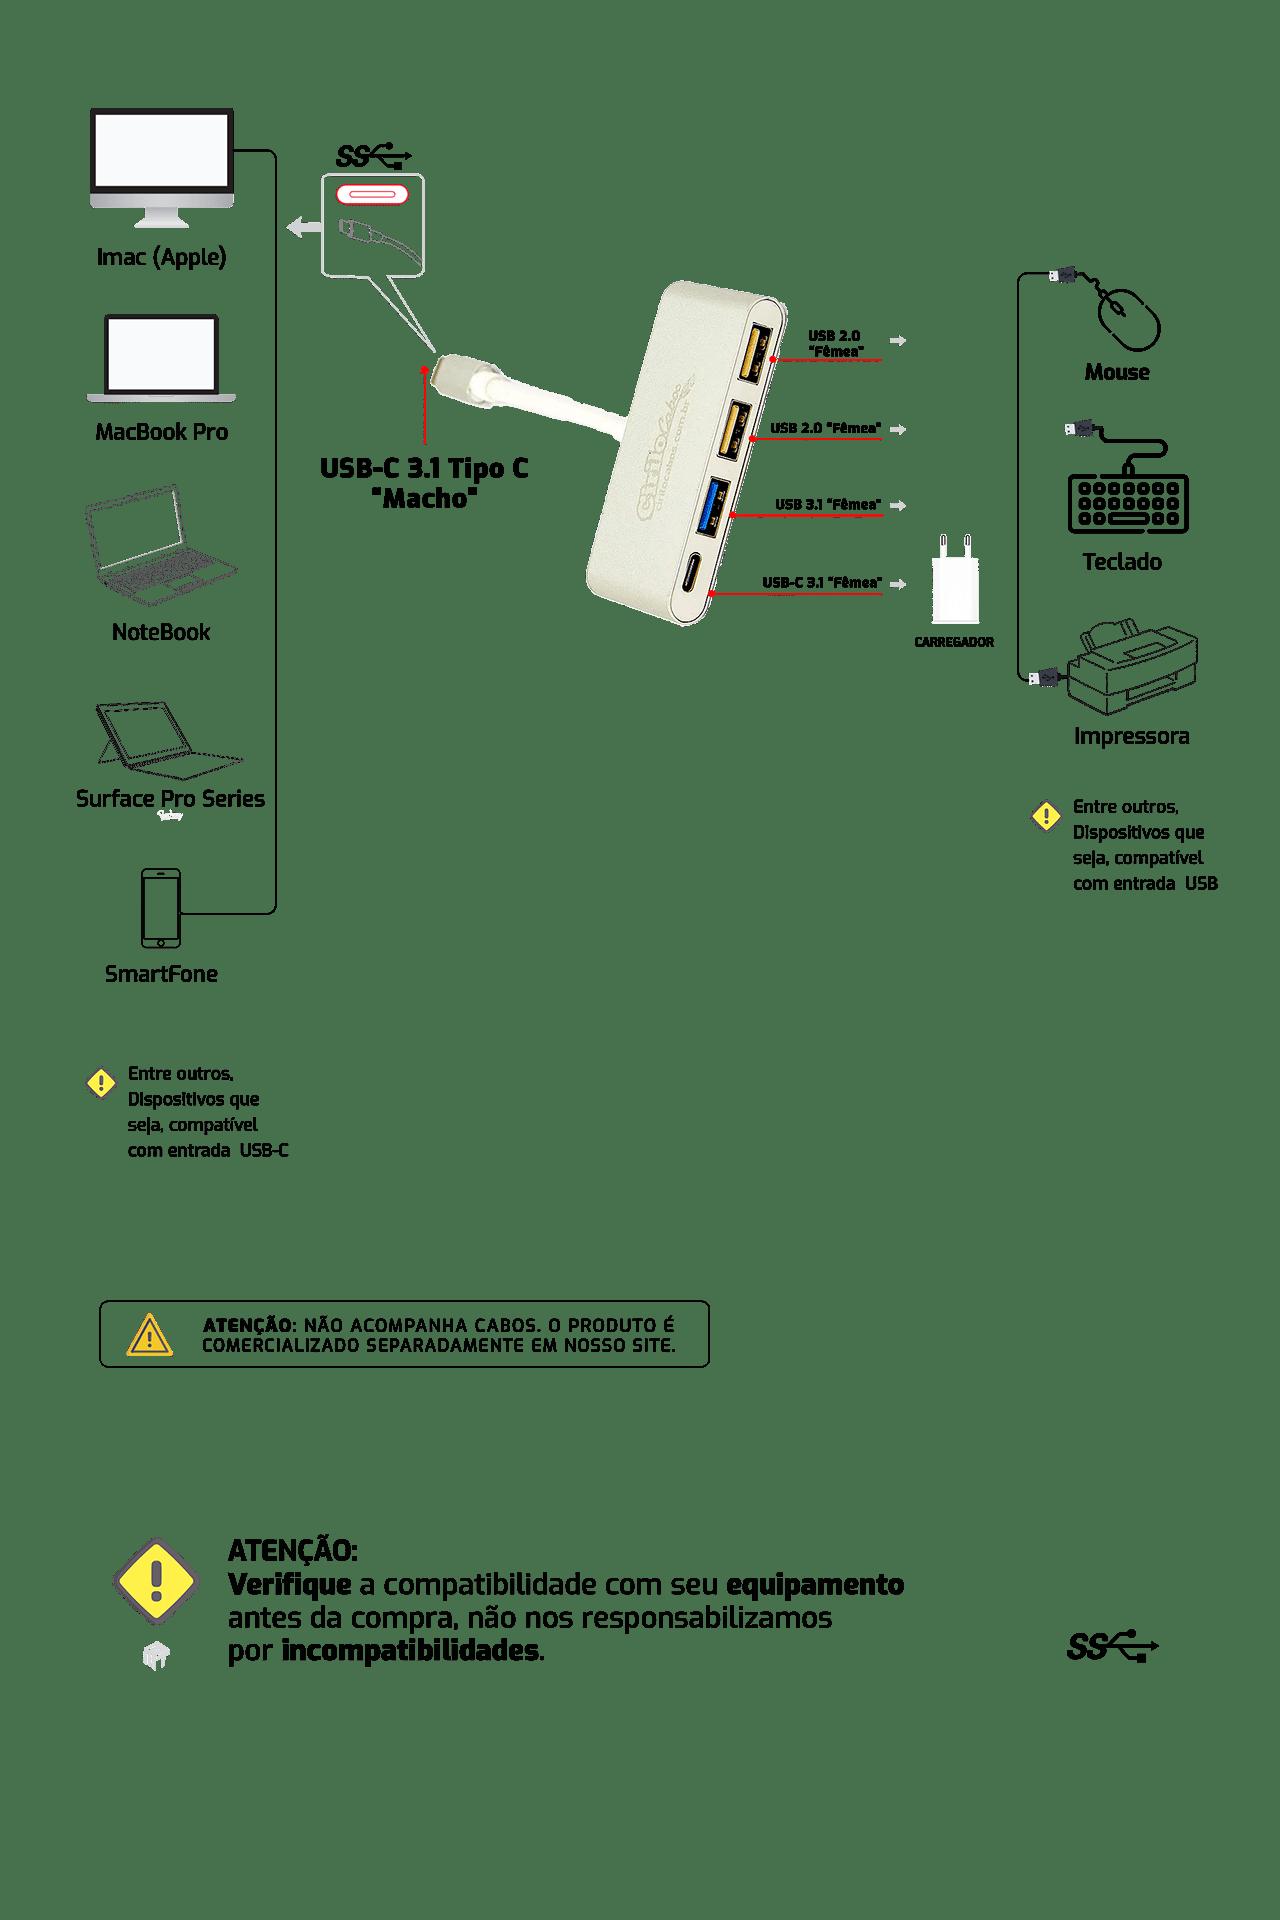 Cabo Adaptador USB-C 3.1 para USB 2.0, 3.1 e C